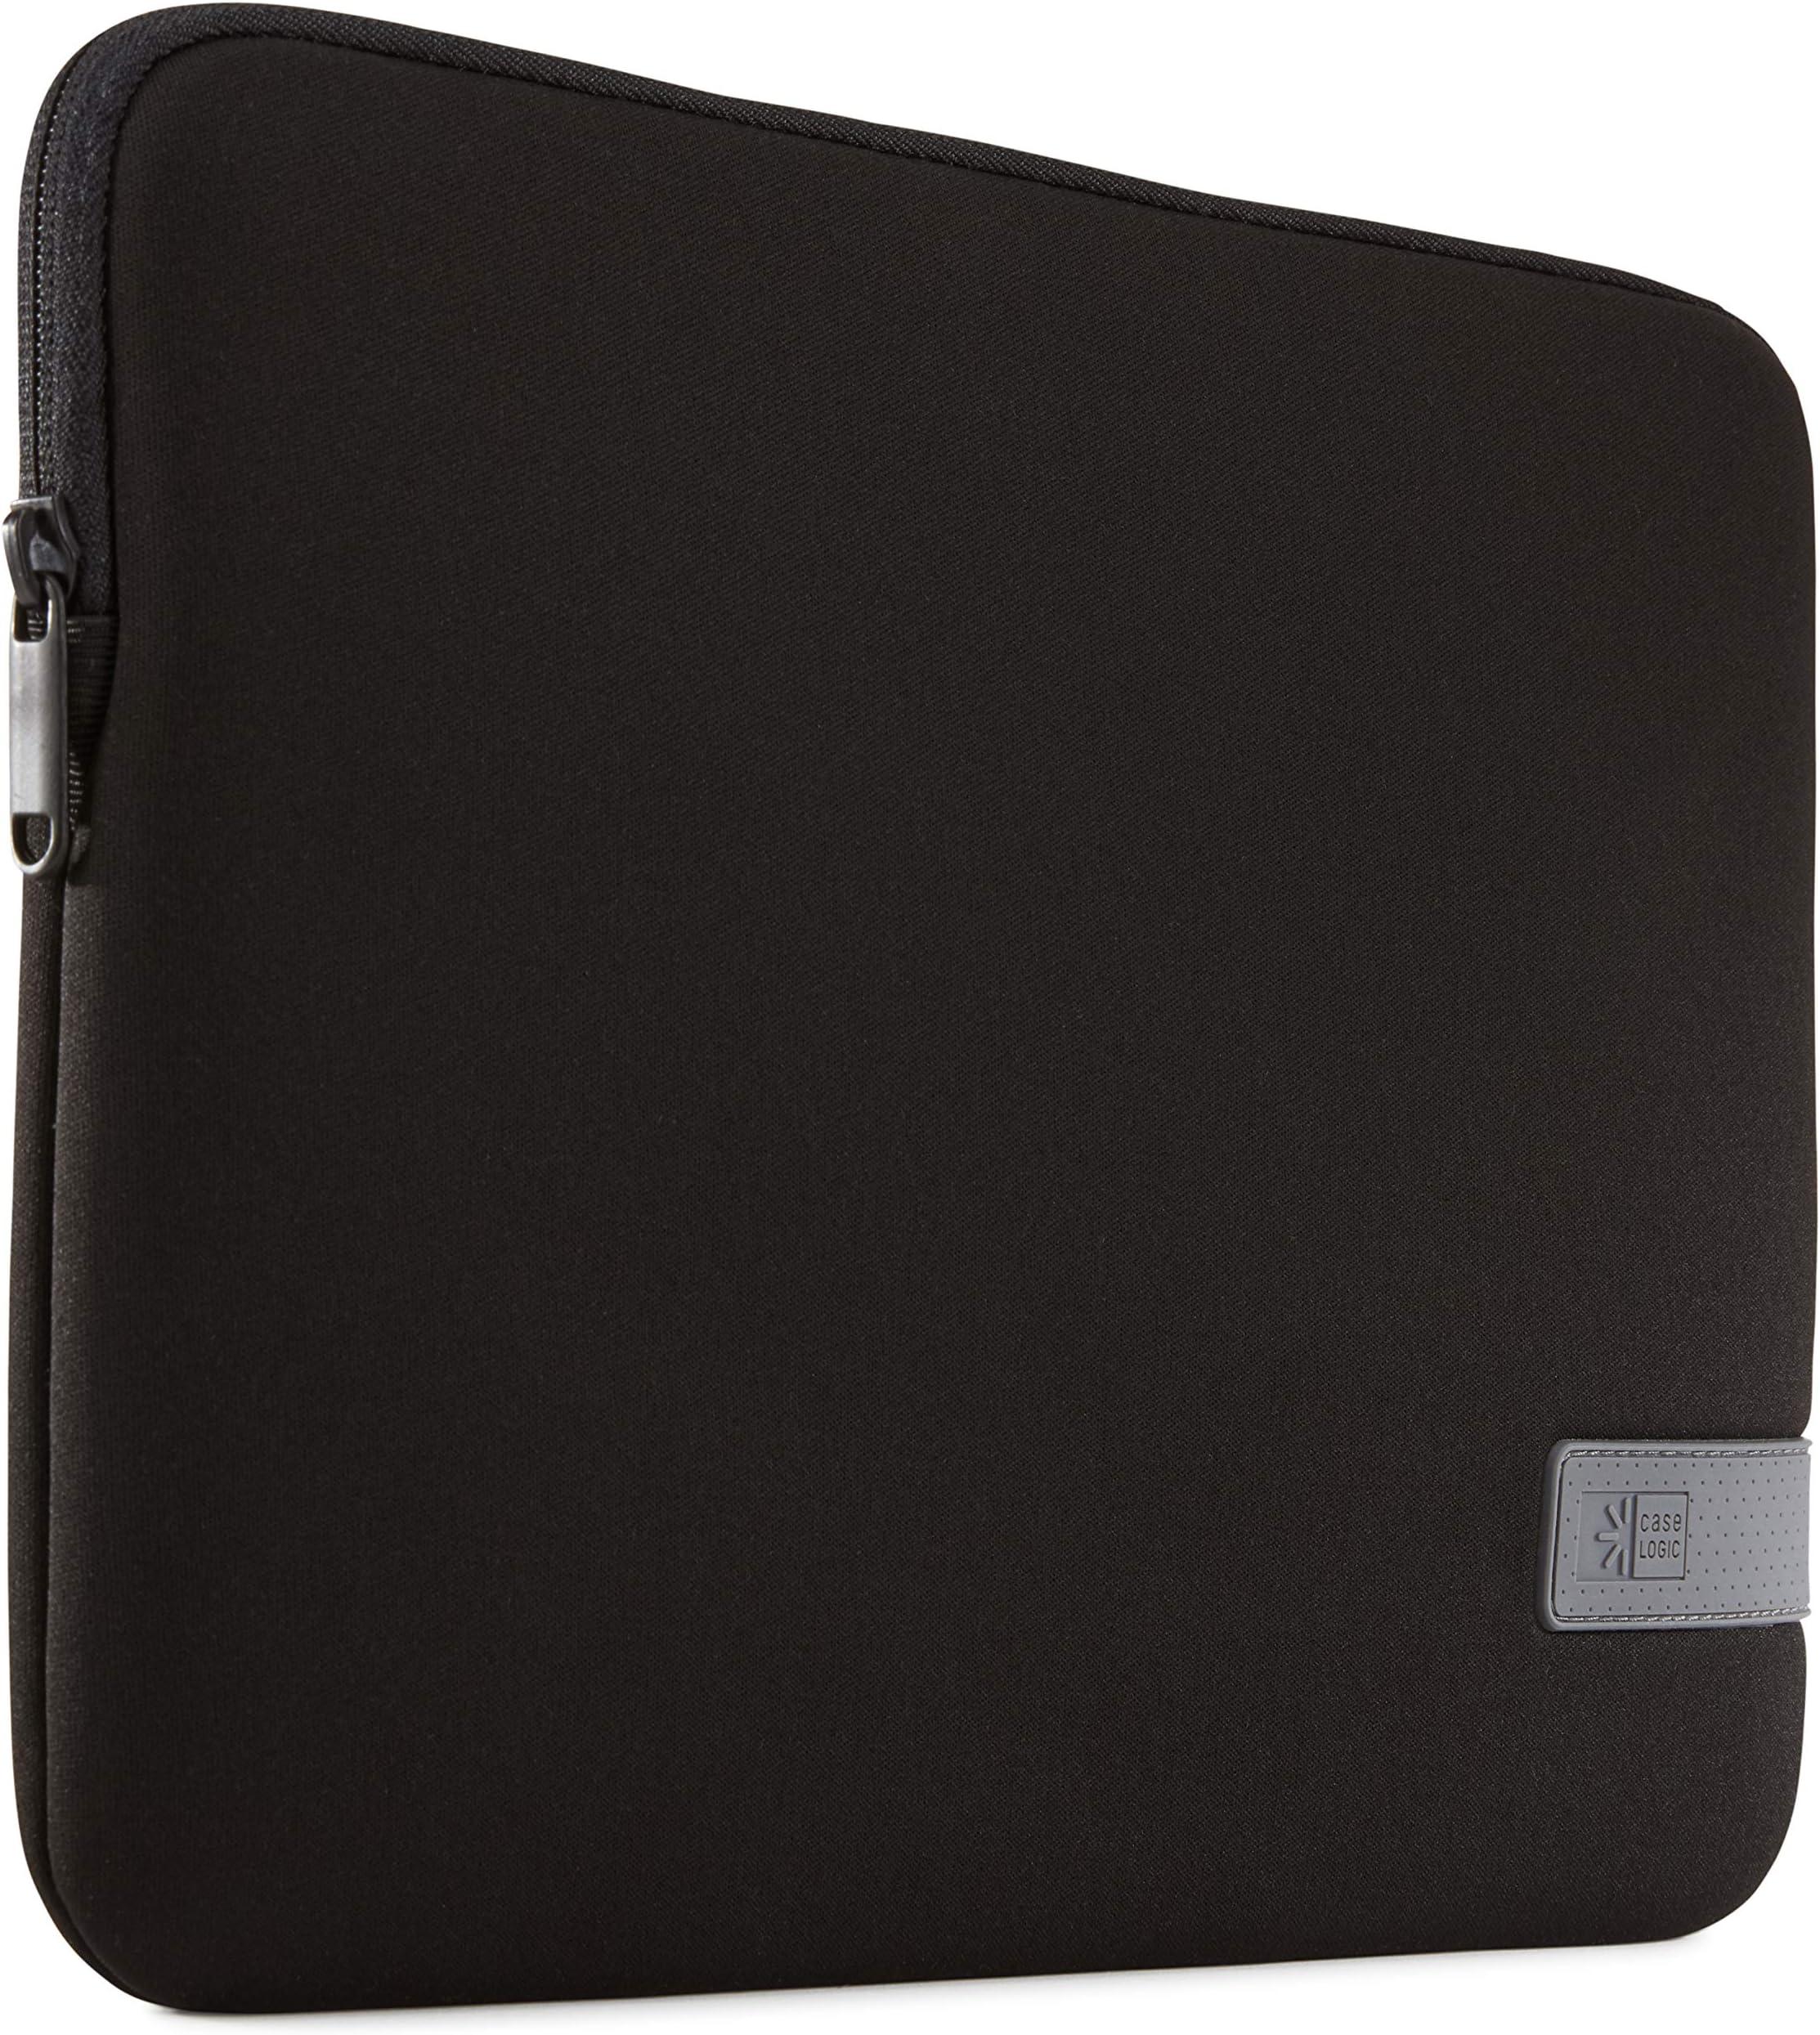 "Case Logic Reflect 13"" MacBook Pro Sleeve-Dark Blue, Black"